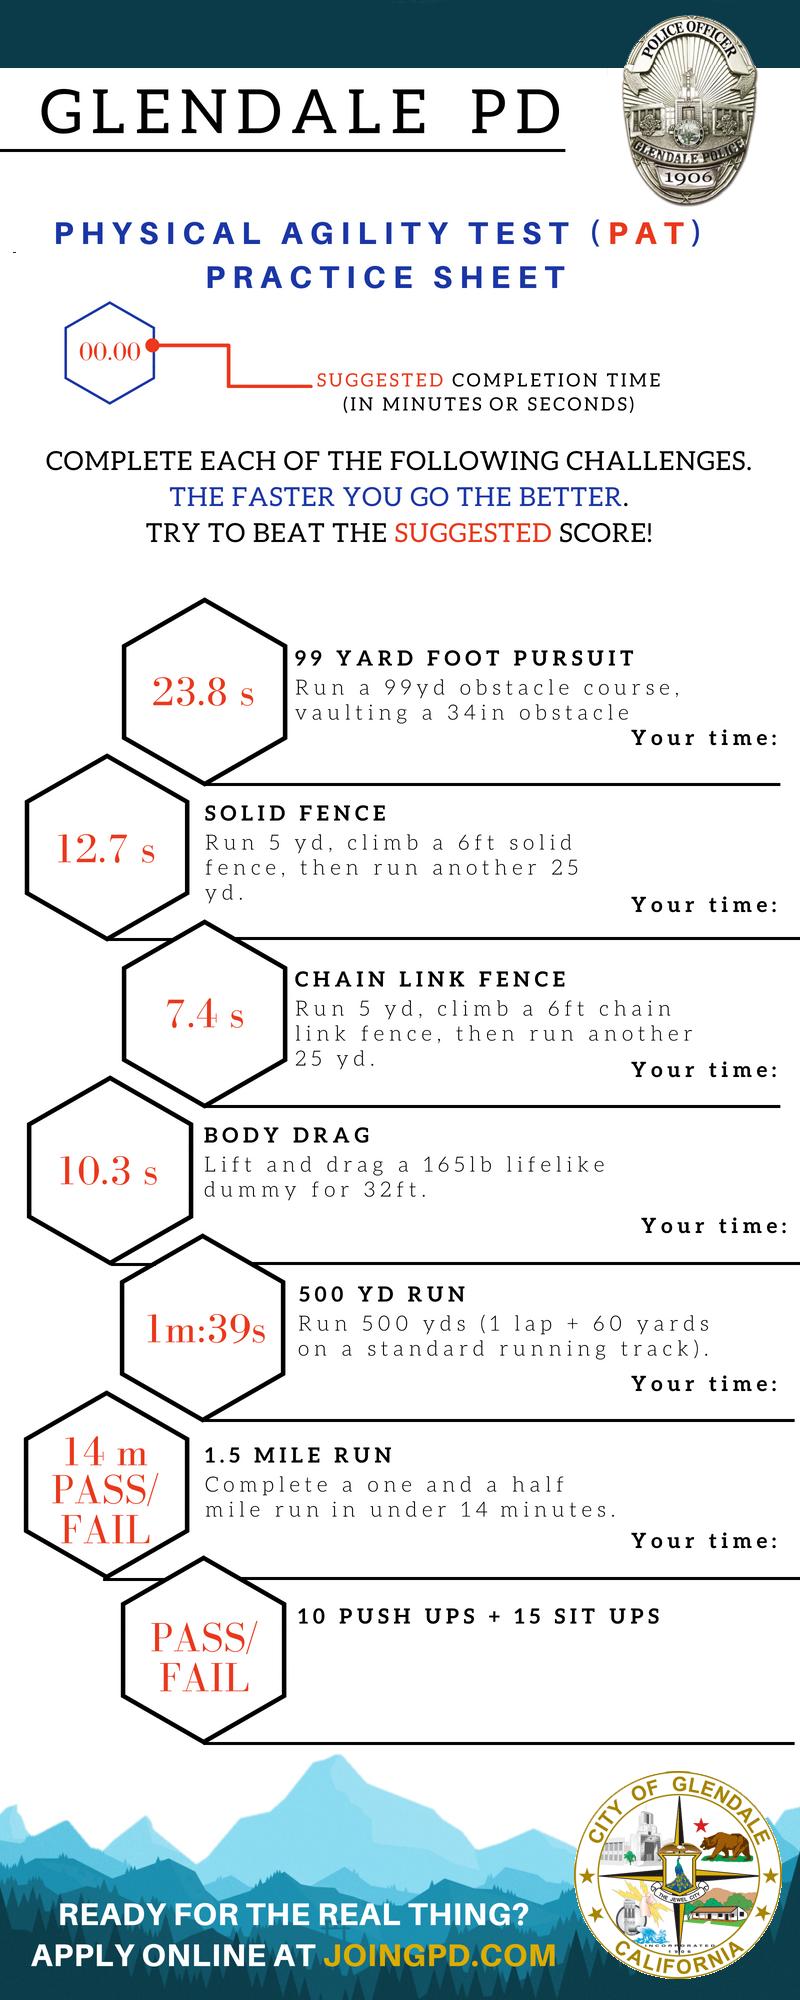 ddf1811f2b6 10 PUSH-UPS AND 15 SIT-UPS (PASS FAIL)